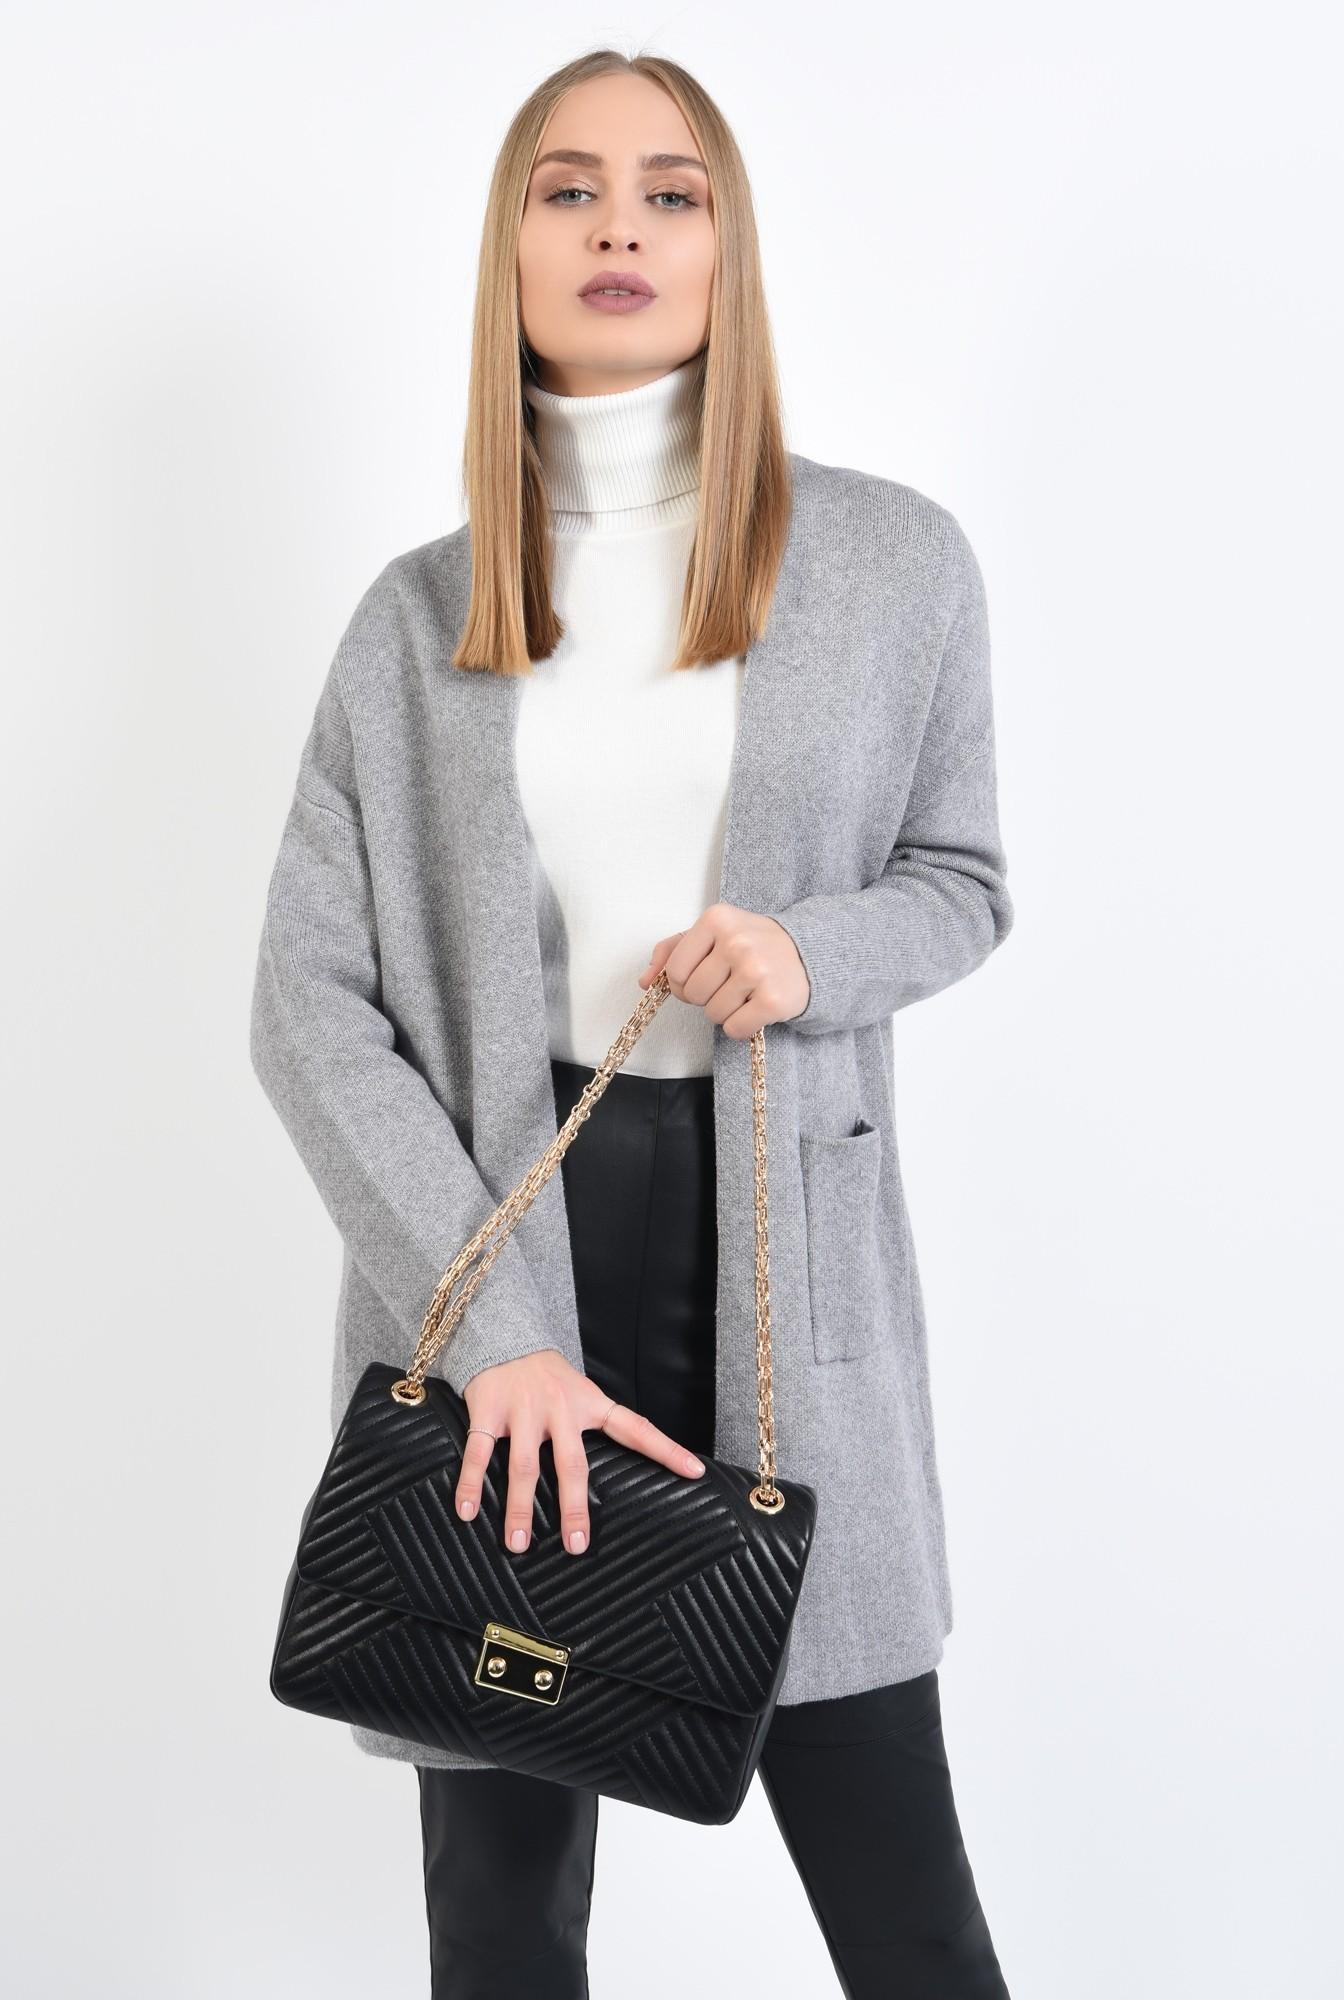 0 - pulover gri, jacheta de toamna, croi drept lejer